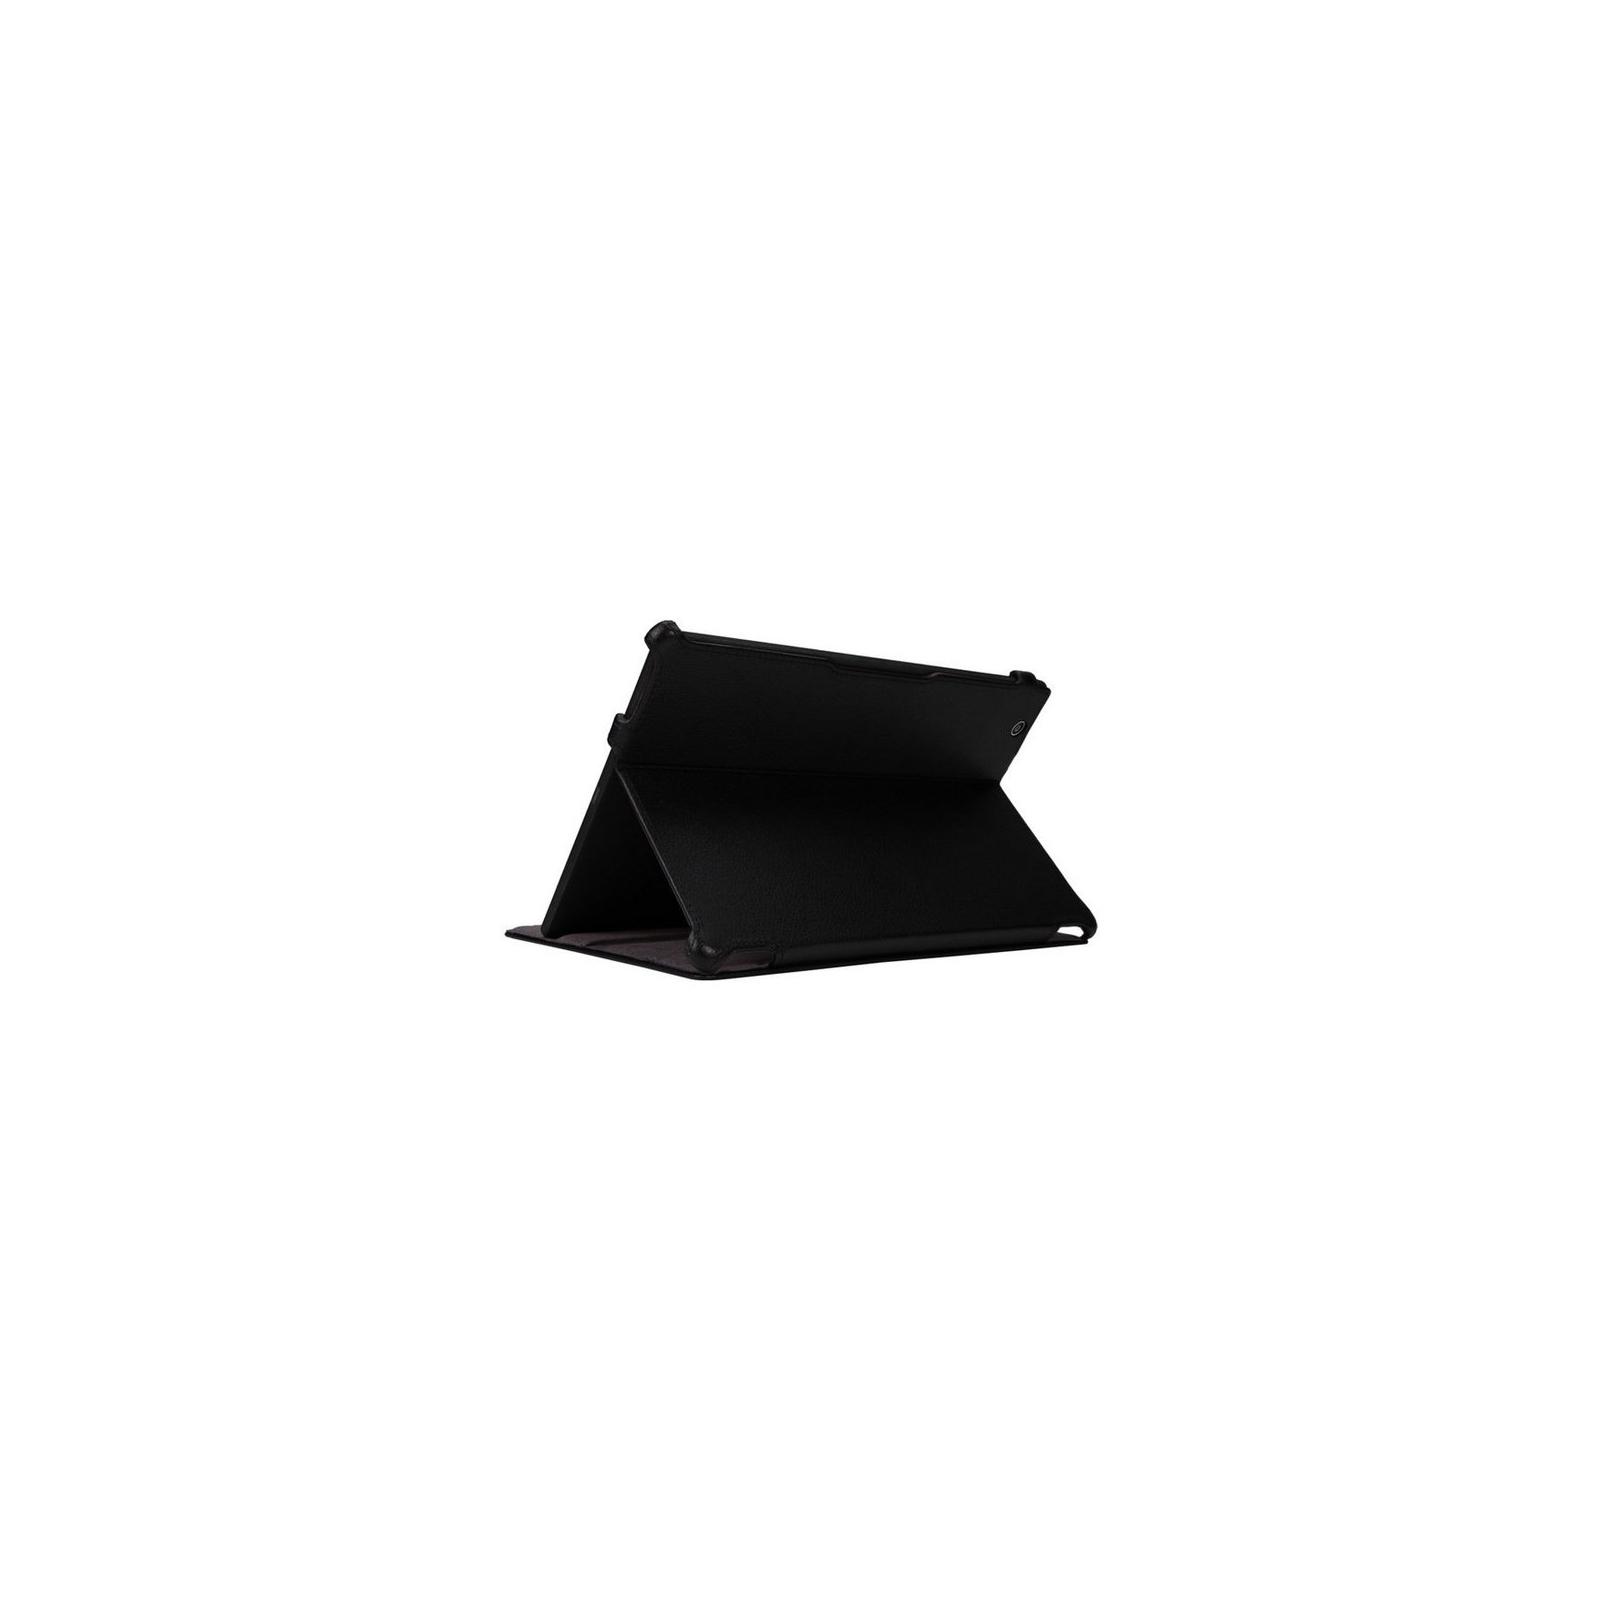 Чехол для планшета AirOn для Sony Xperia Tablet Z4 (4822356754484) изображение 7